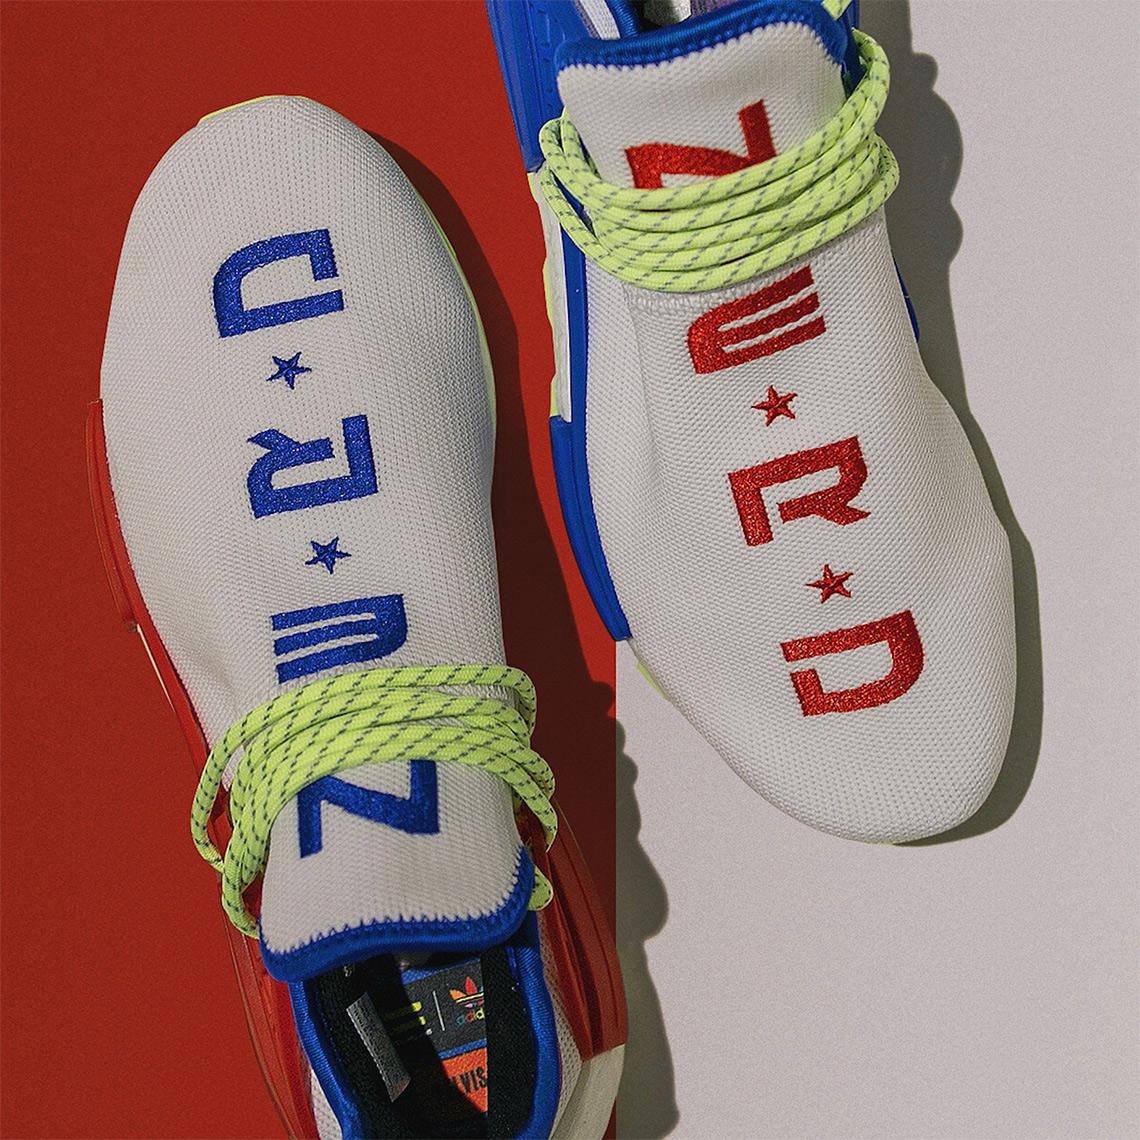 new product bddfa 2e7e7 Pharrell x NERD x adidas NMD Hu